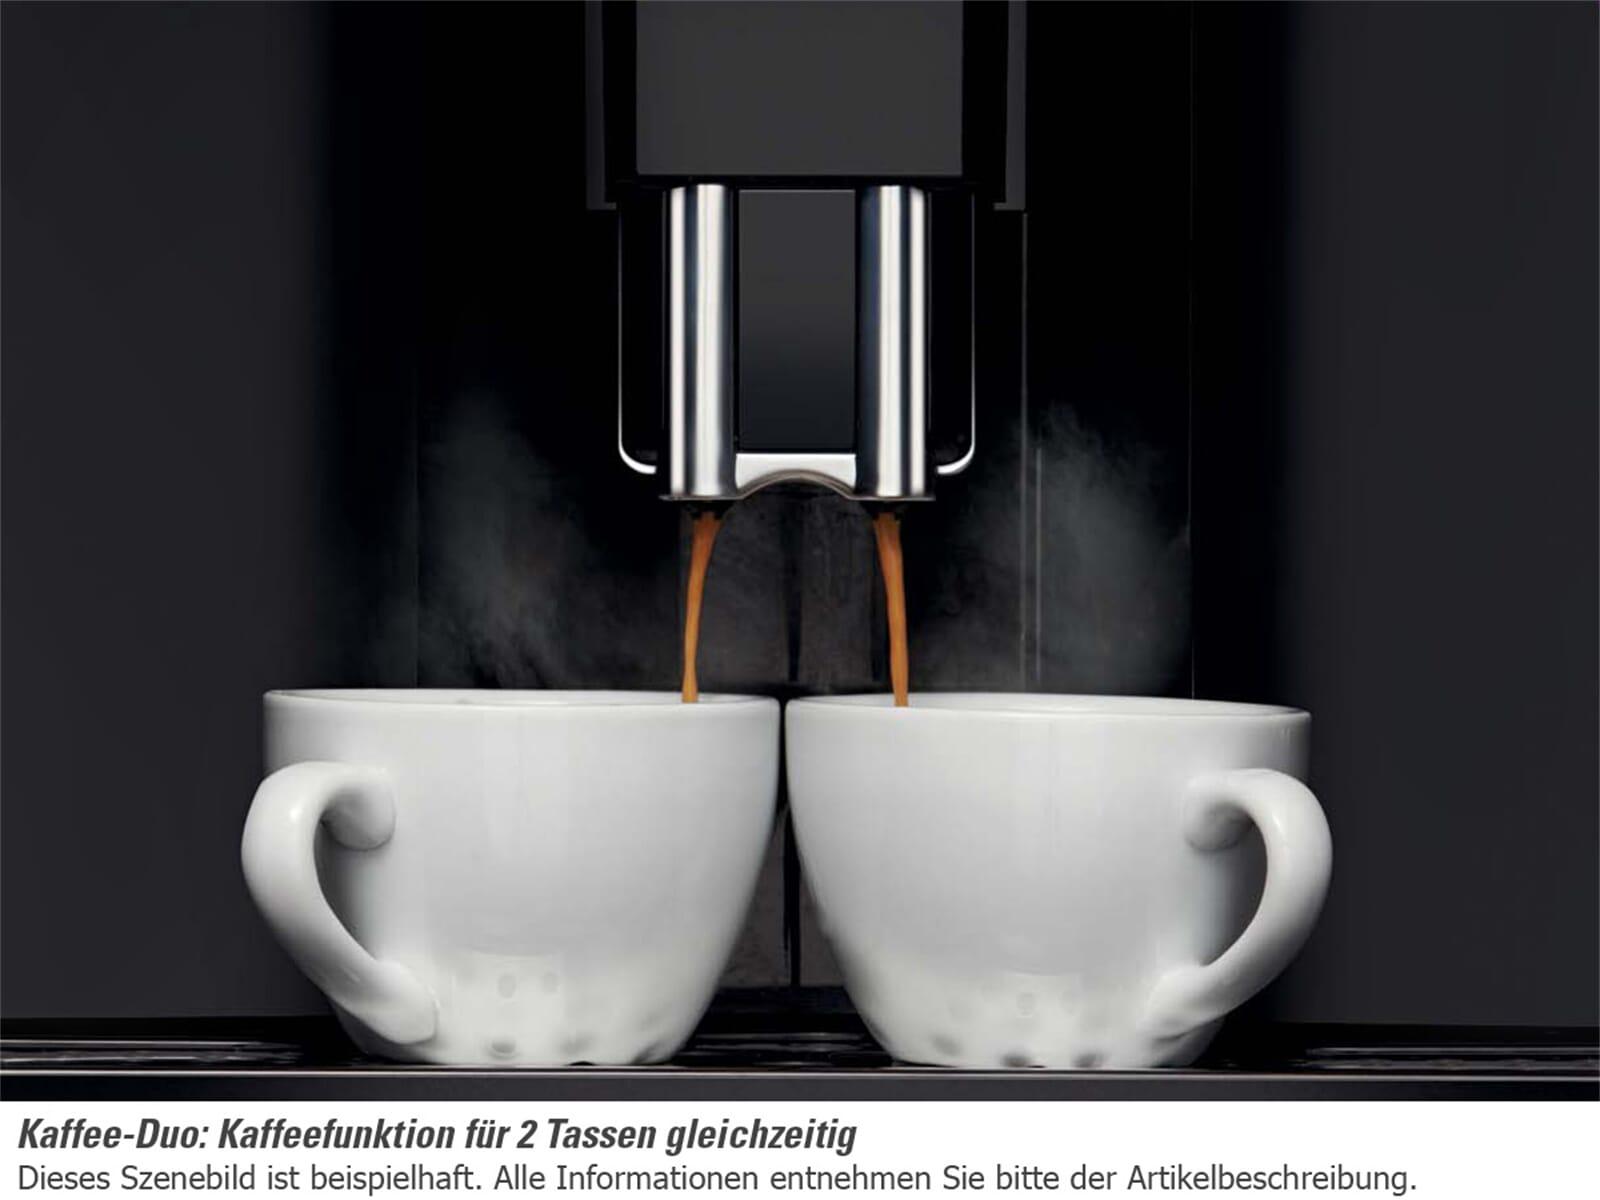 Smeg CMS6451X Einbau-Espresso-/Kaffeevollautomat Edelstahl